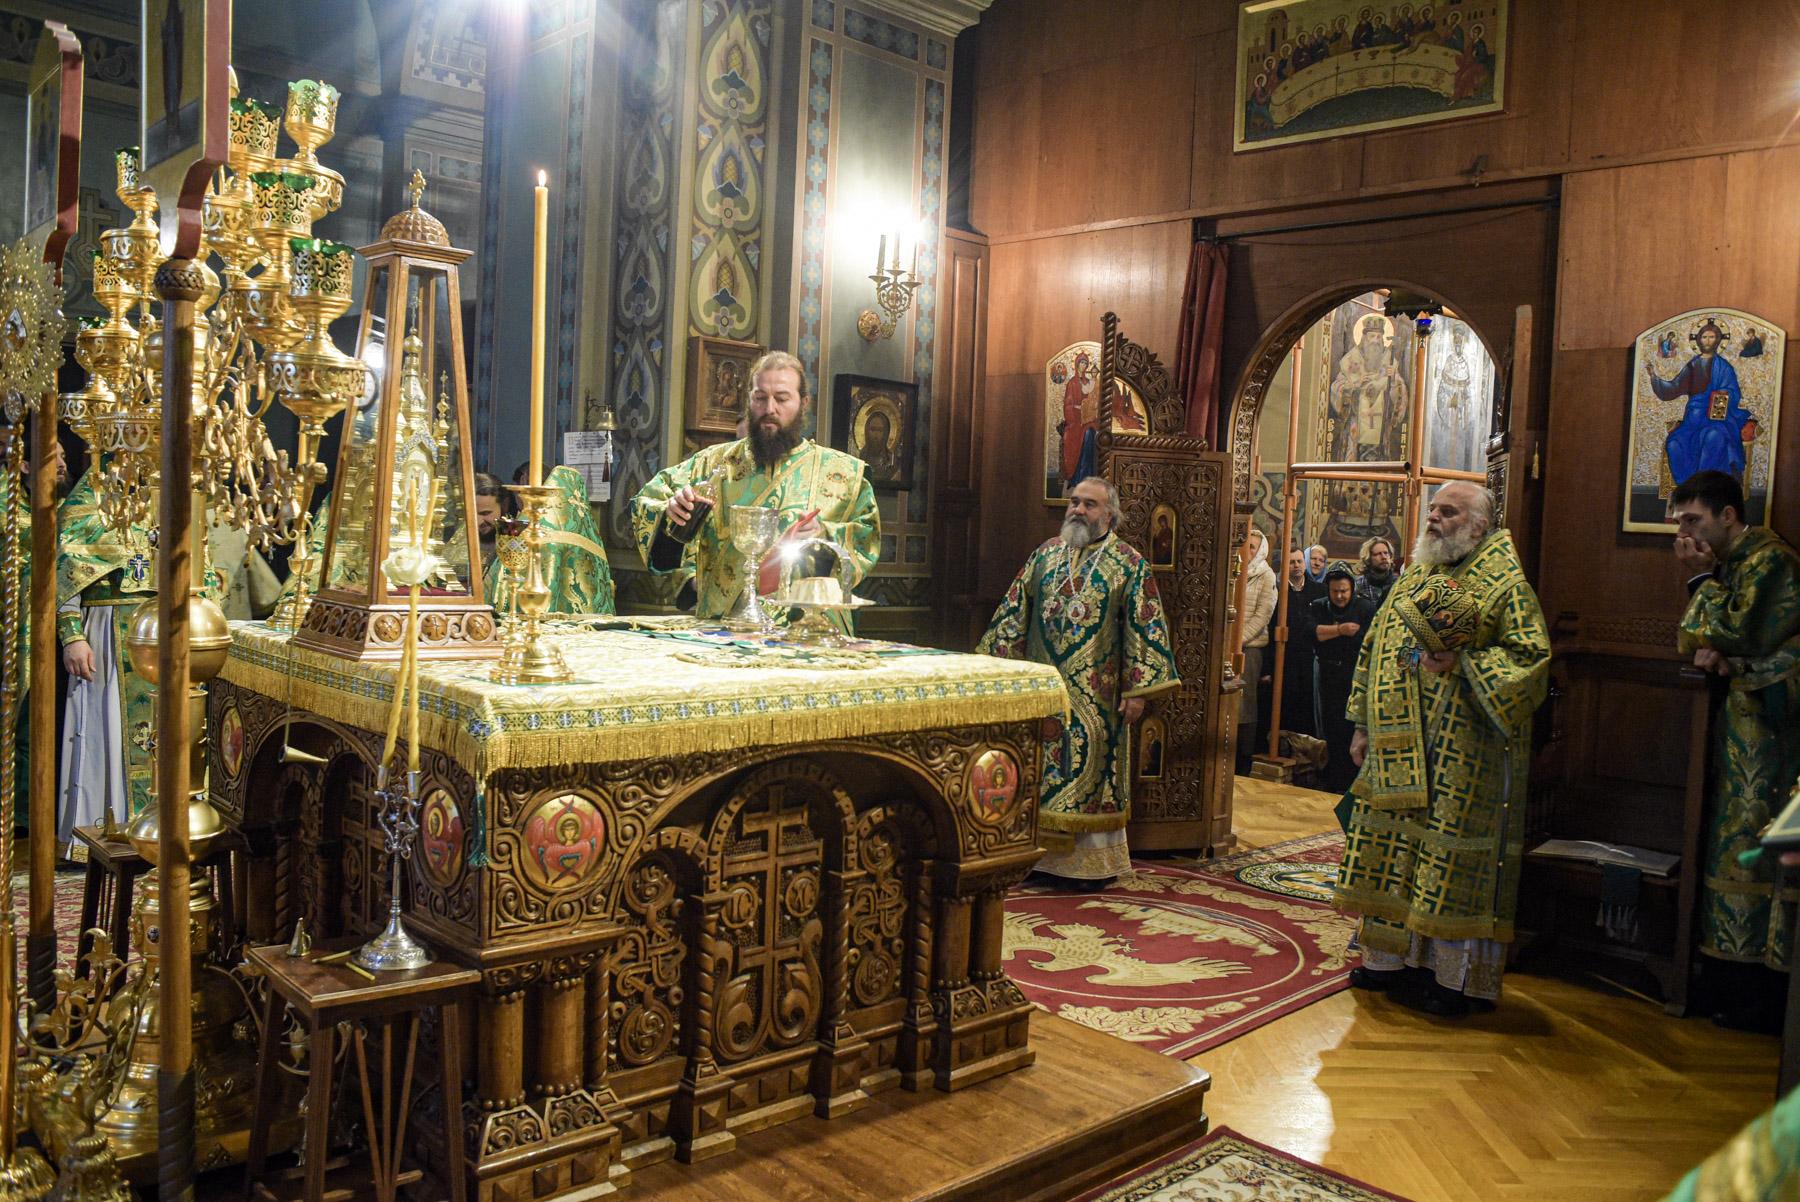 photos of orthodox christmas 0184 2